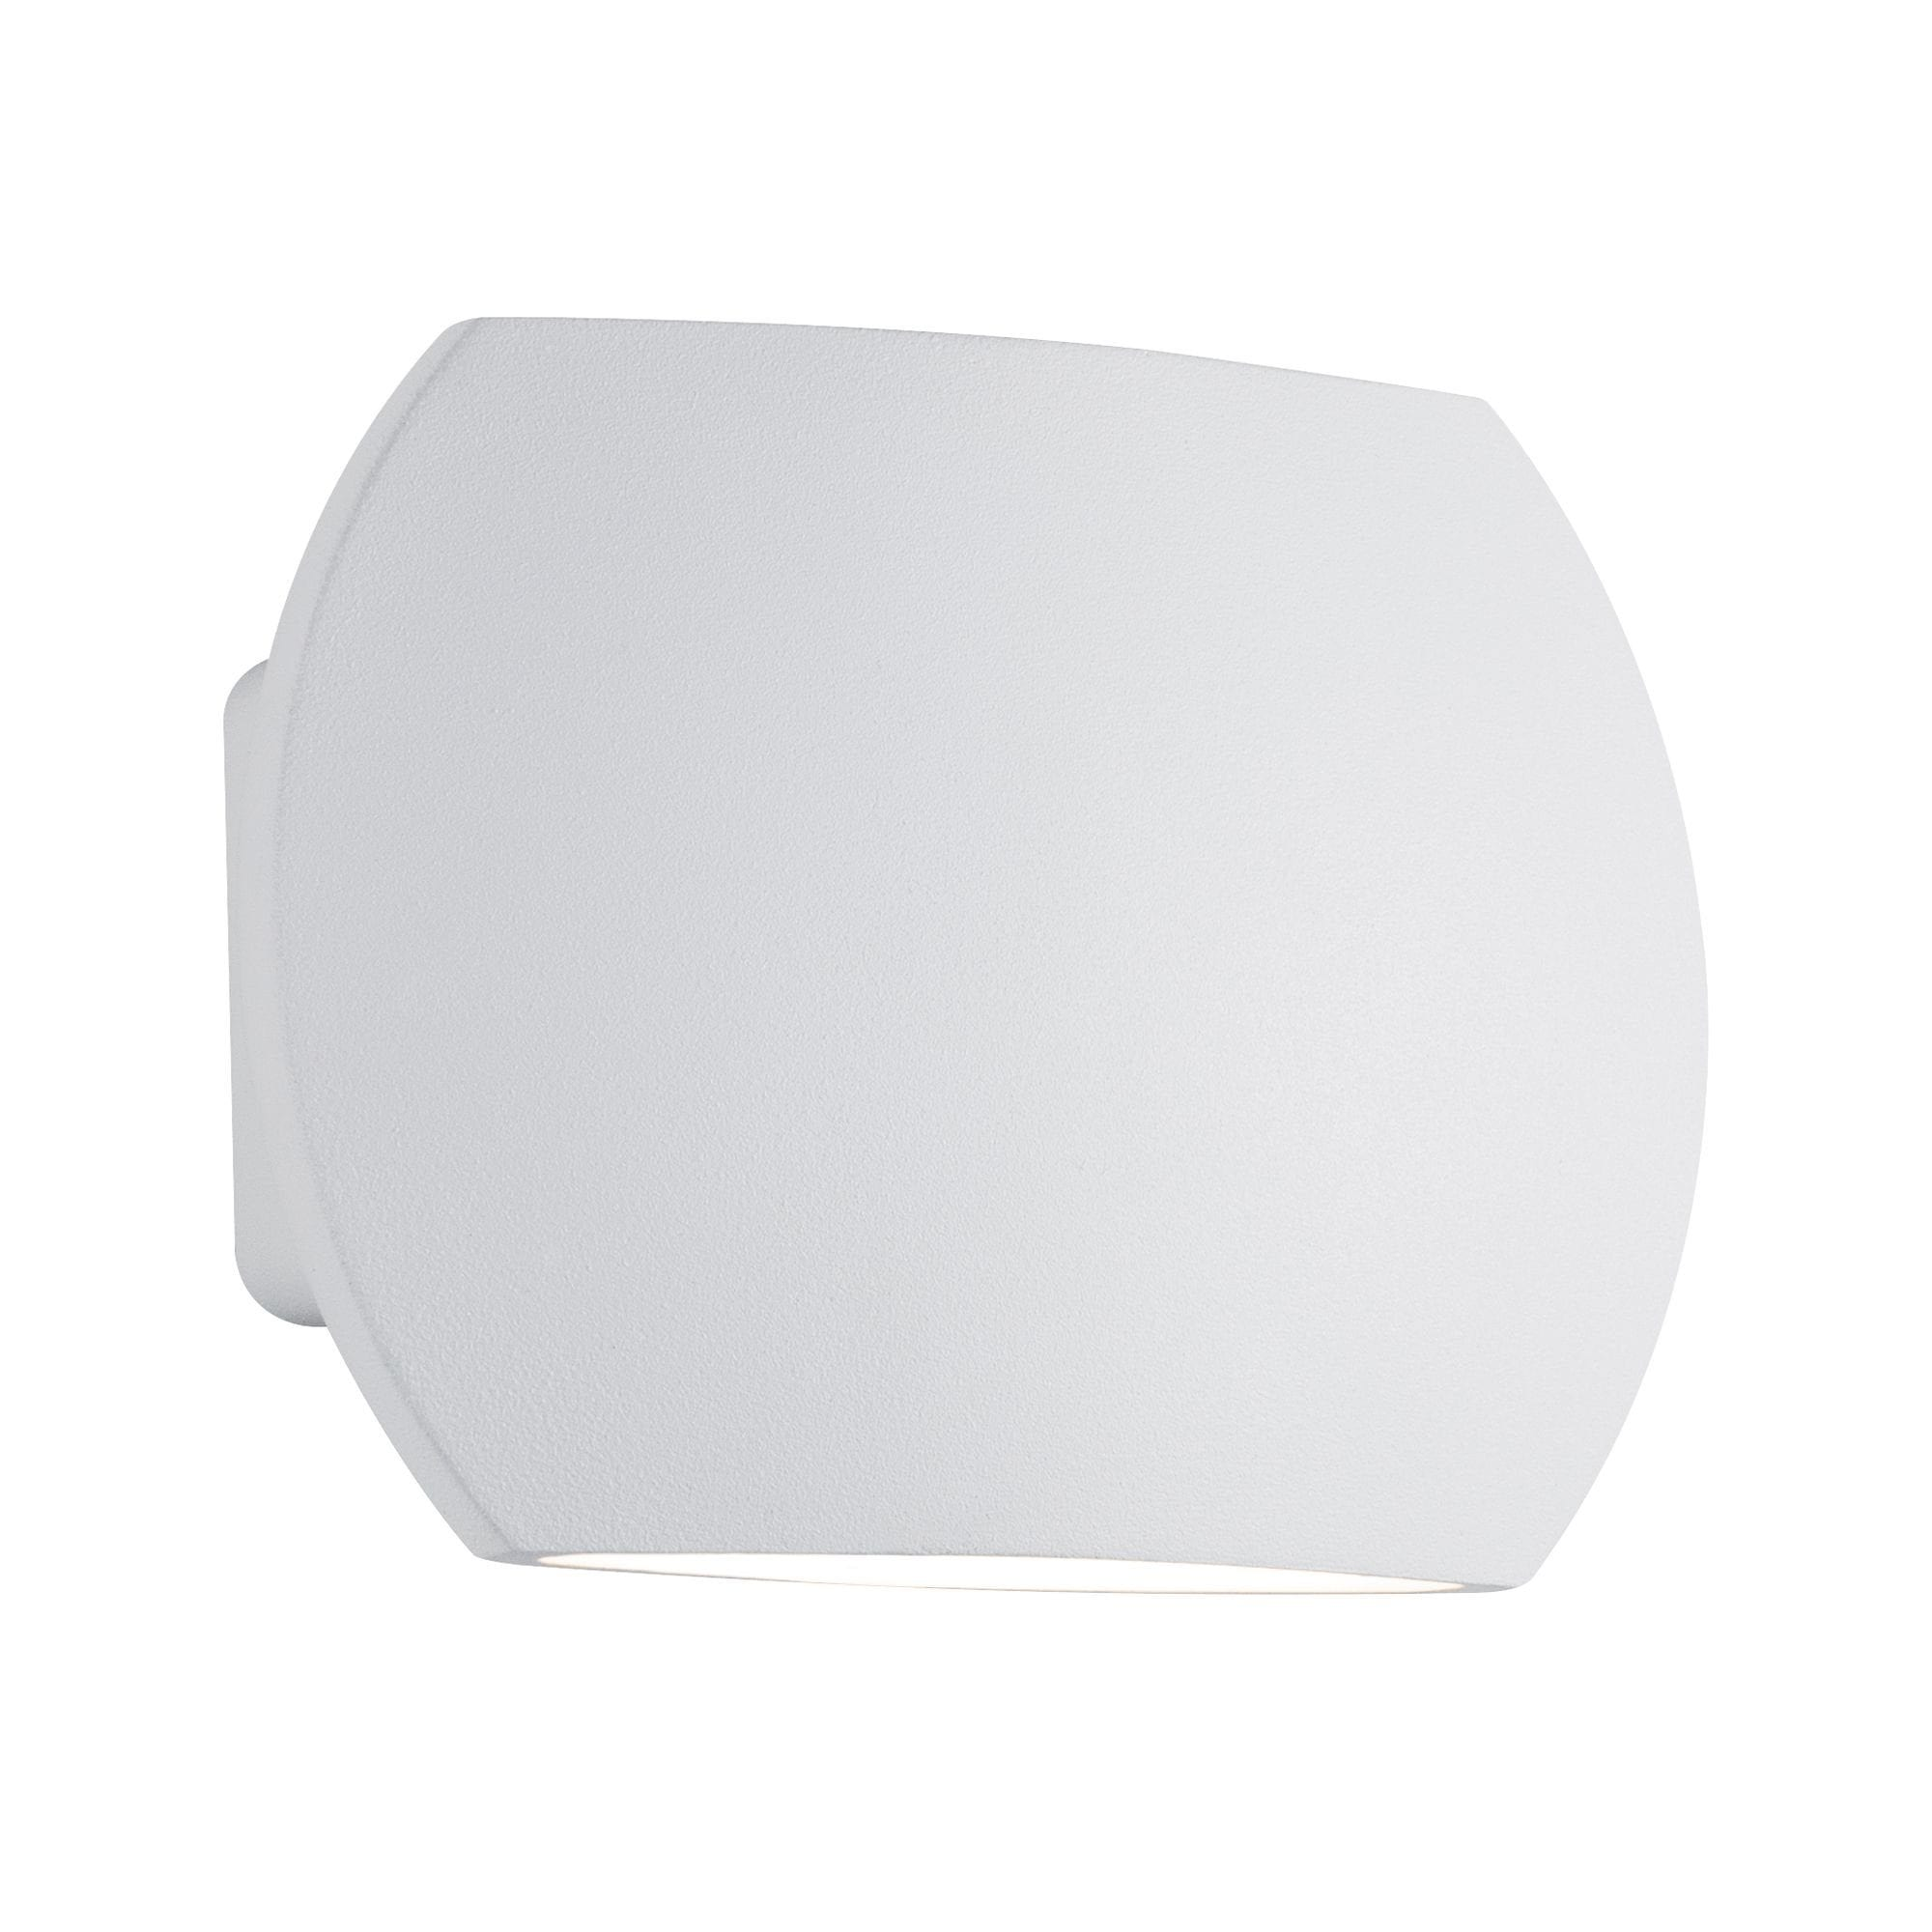 Paulmann,LED Wandleuchte Bocca 2x3W Weiß